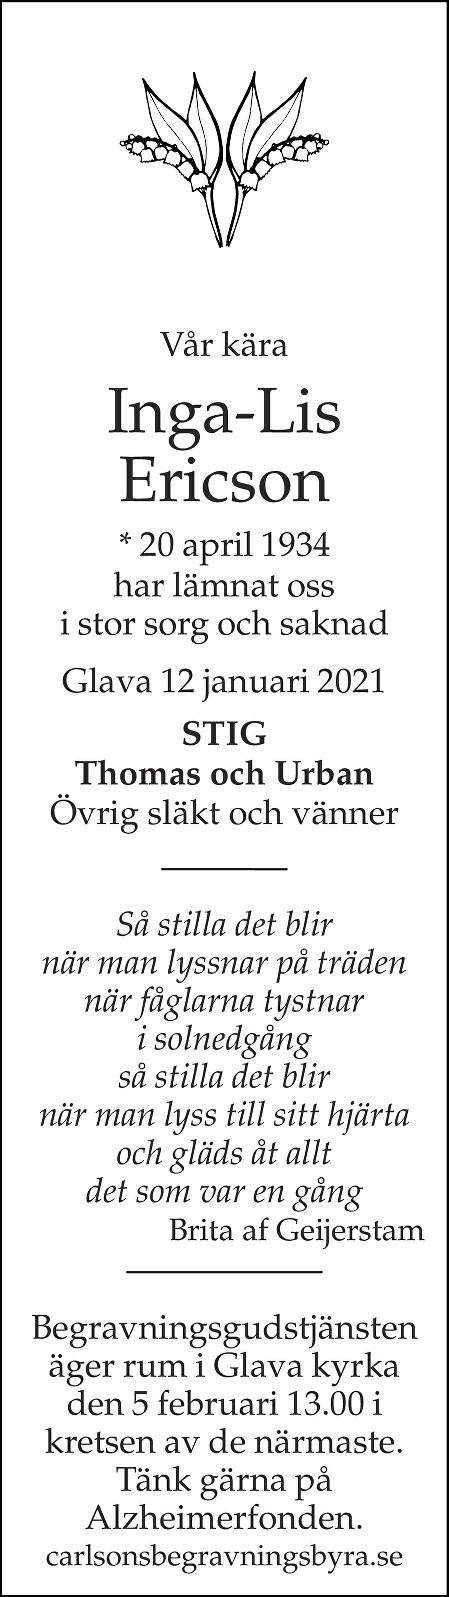 Inga-Lis Eriksson Death notice